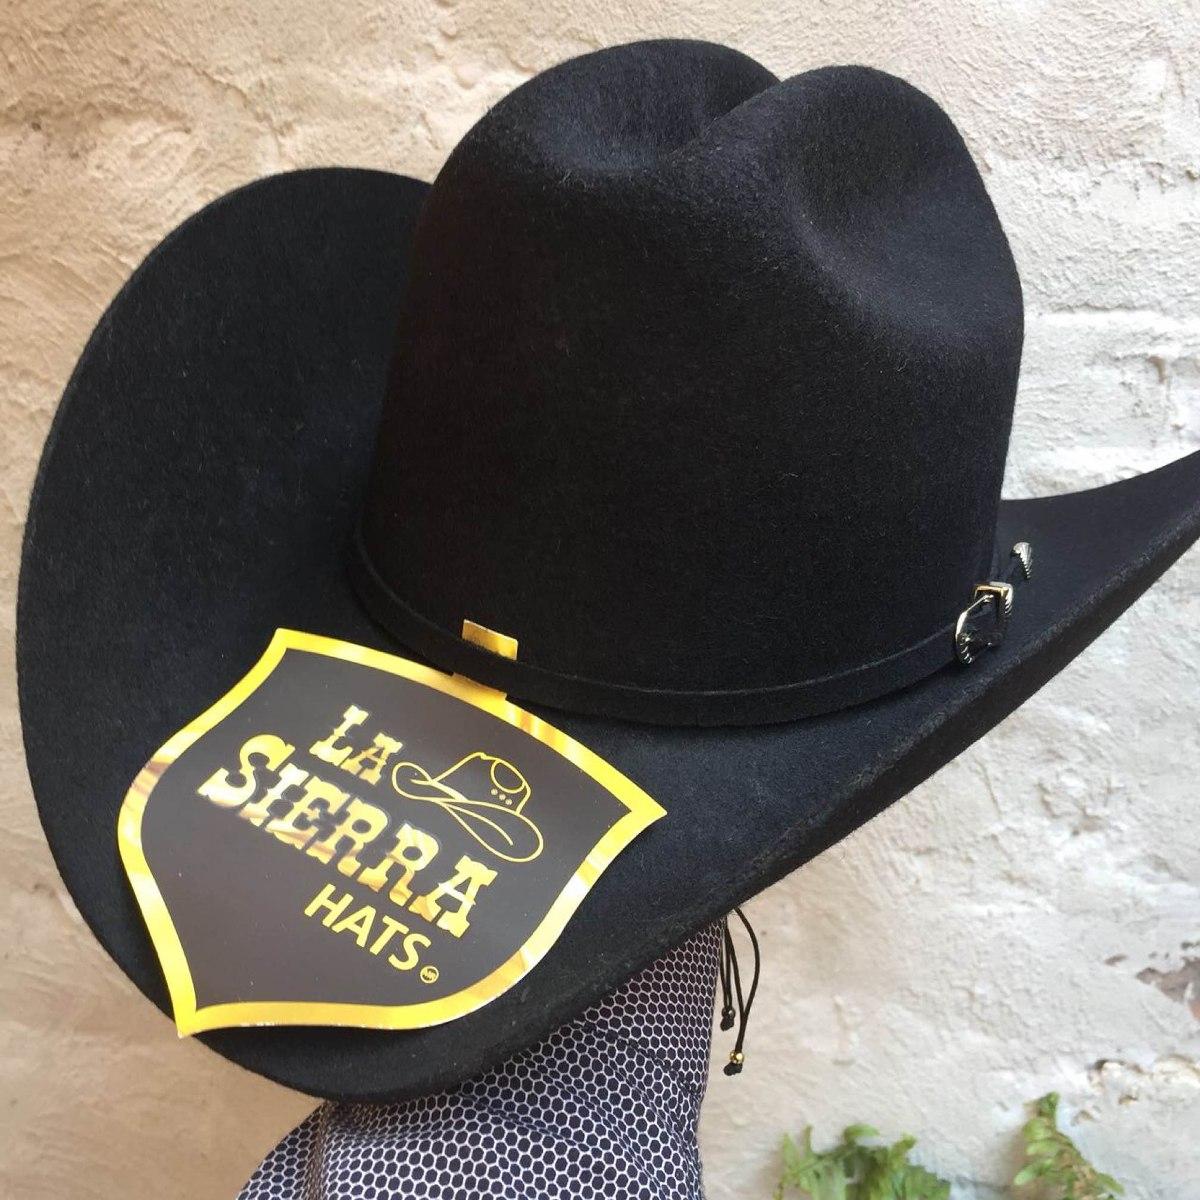 Sombrero Negro Vaquero De Fieltro Horma Lupillo -   409.00 en ... 975731115b3